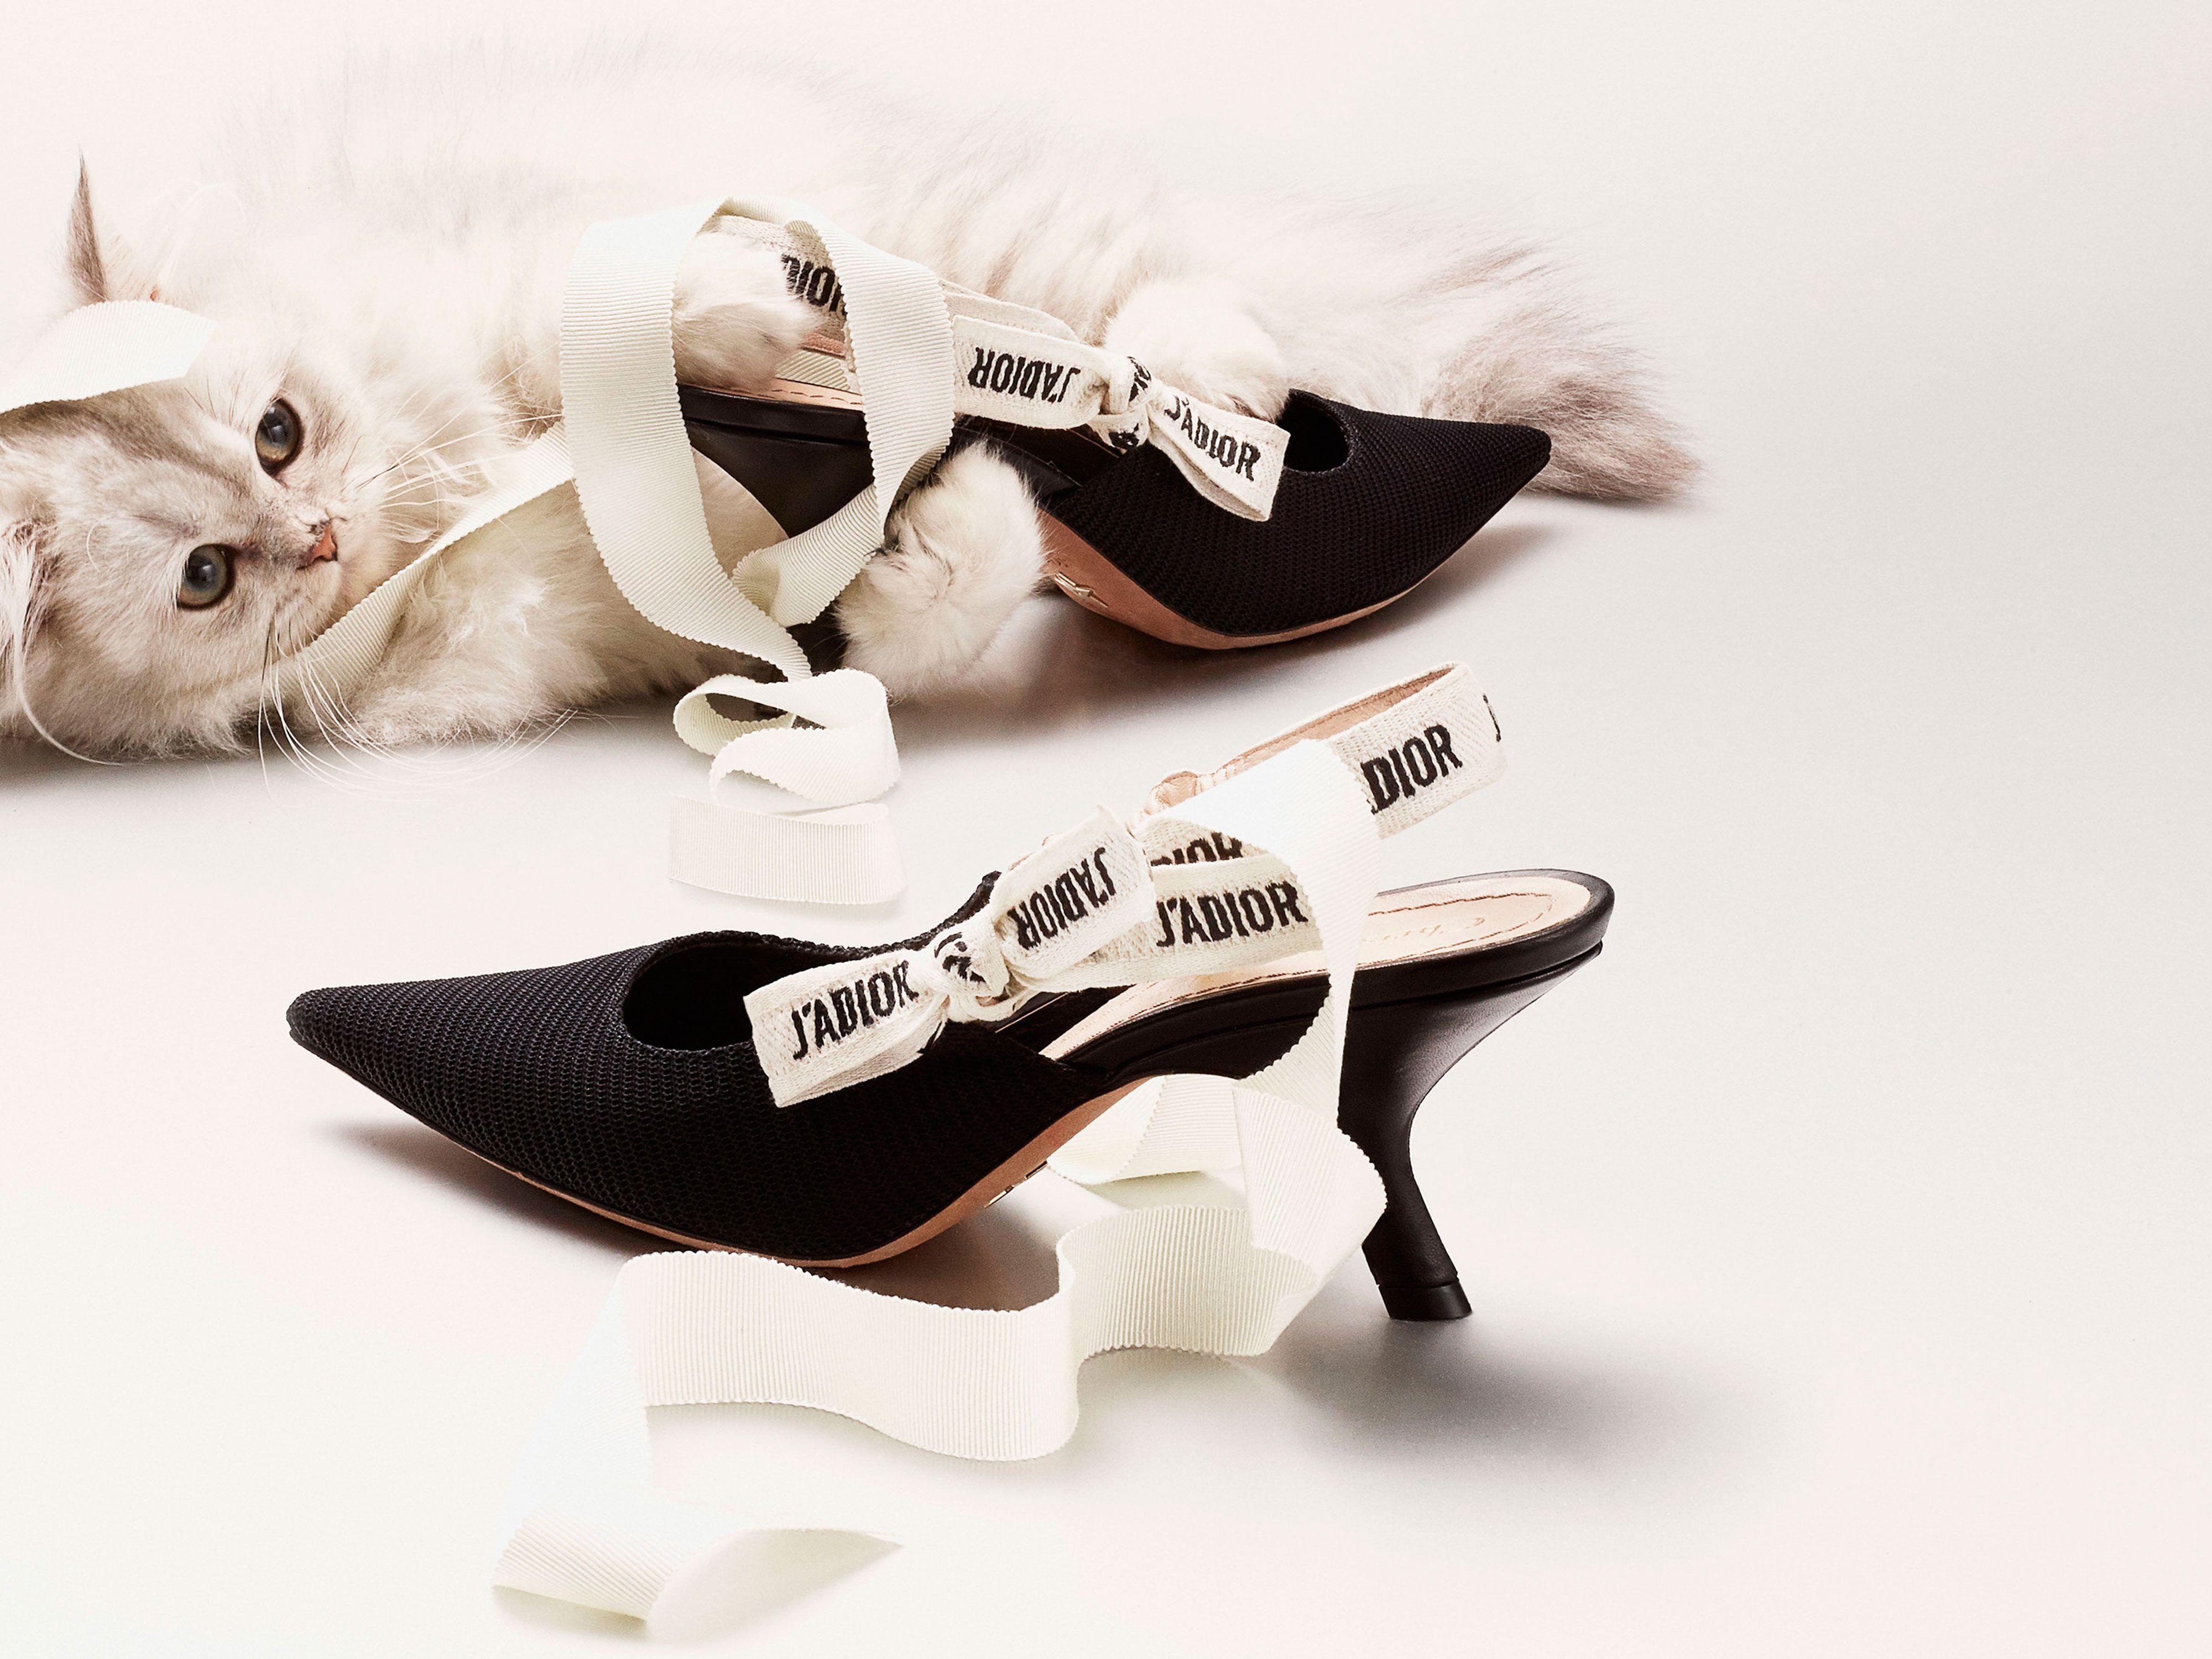 4a780bb5f27 Kitten heels return for spring summer jpg 4000x3000 Dior kitten heels